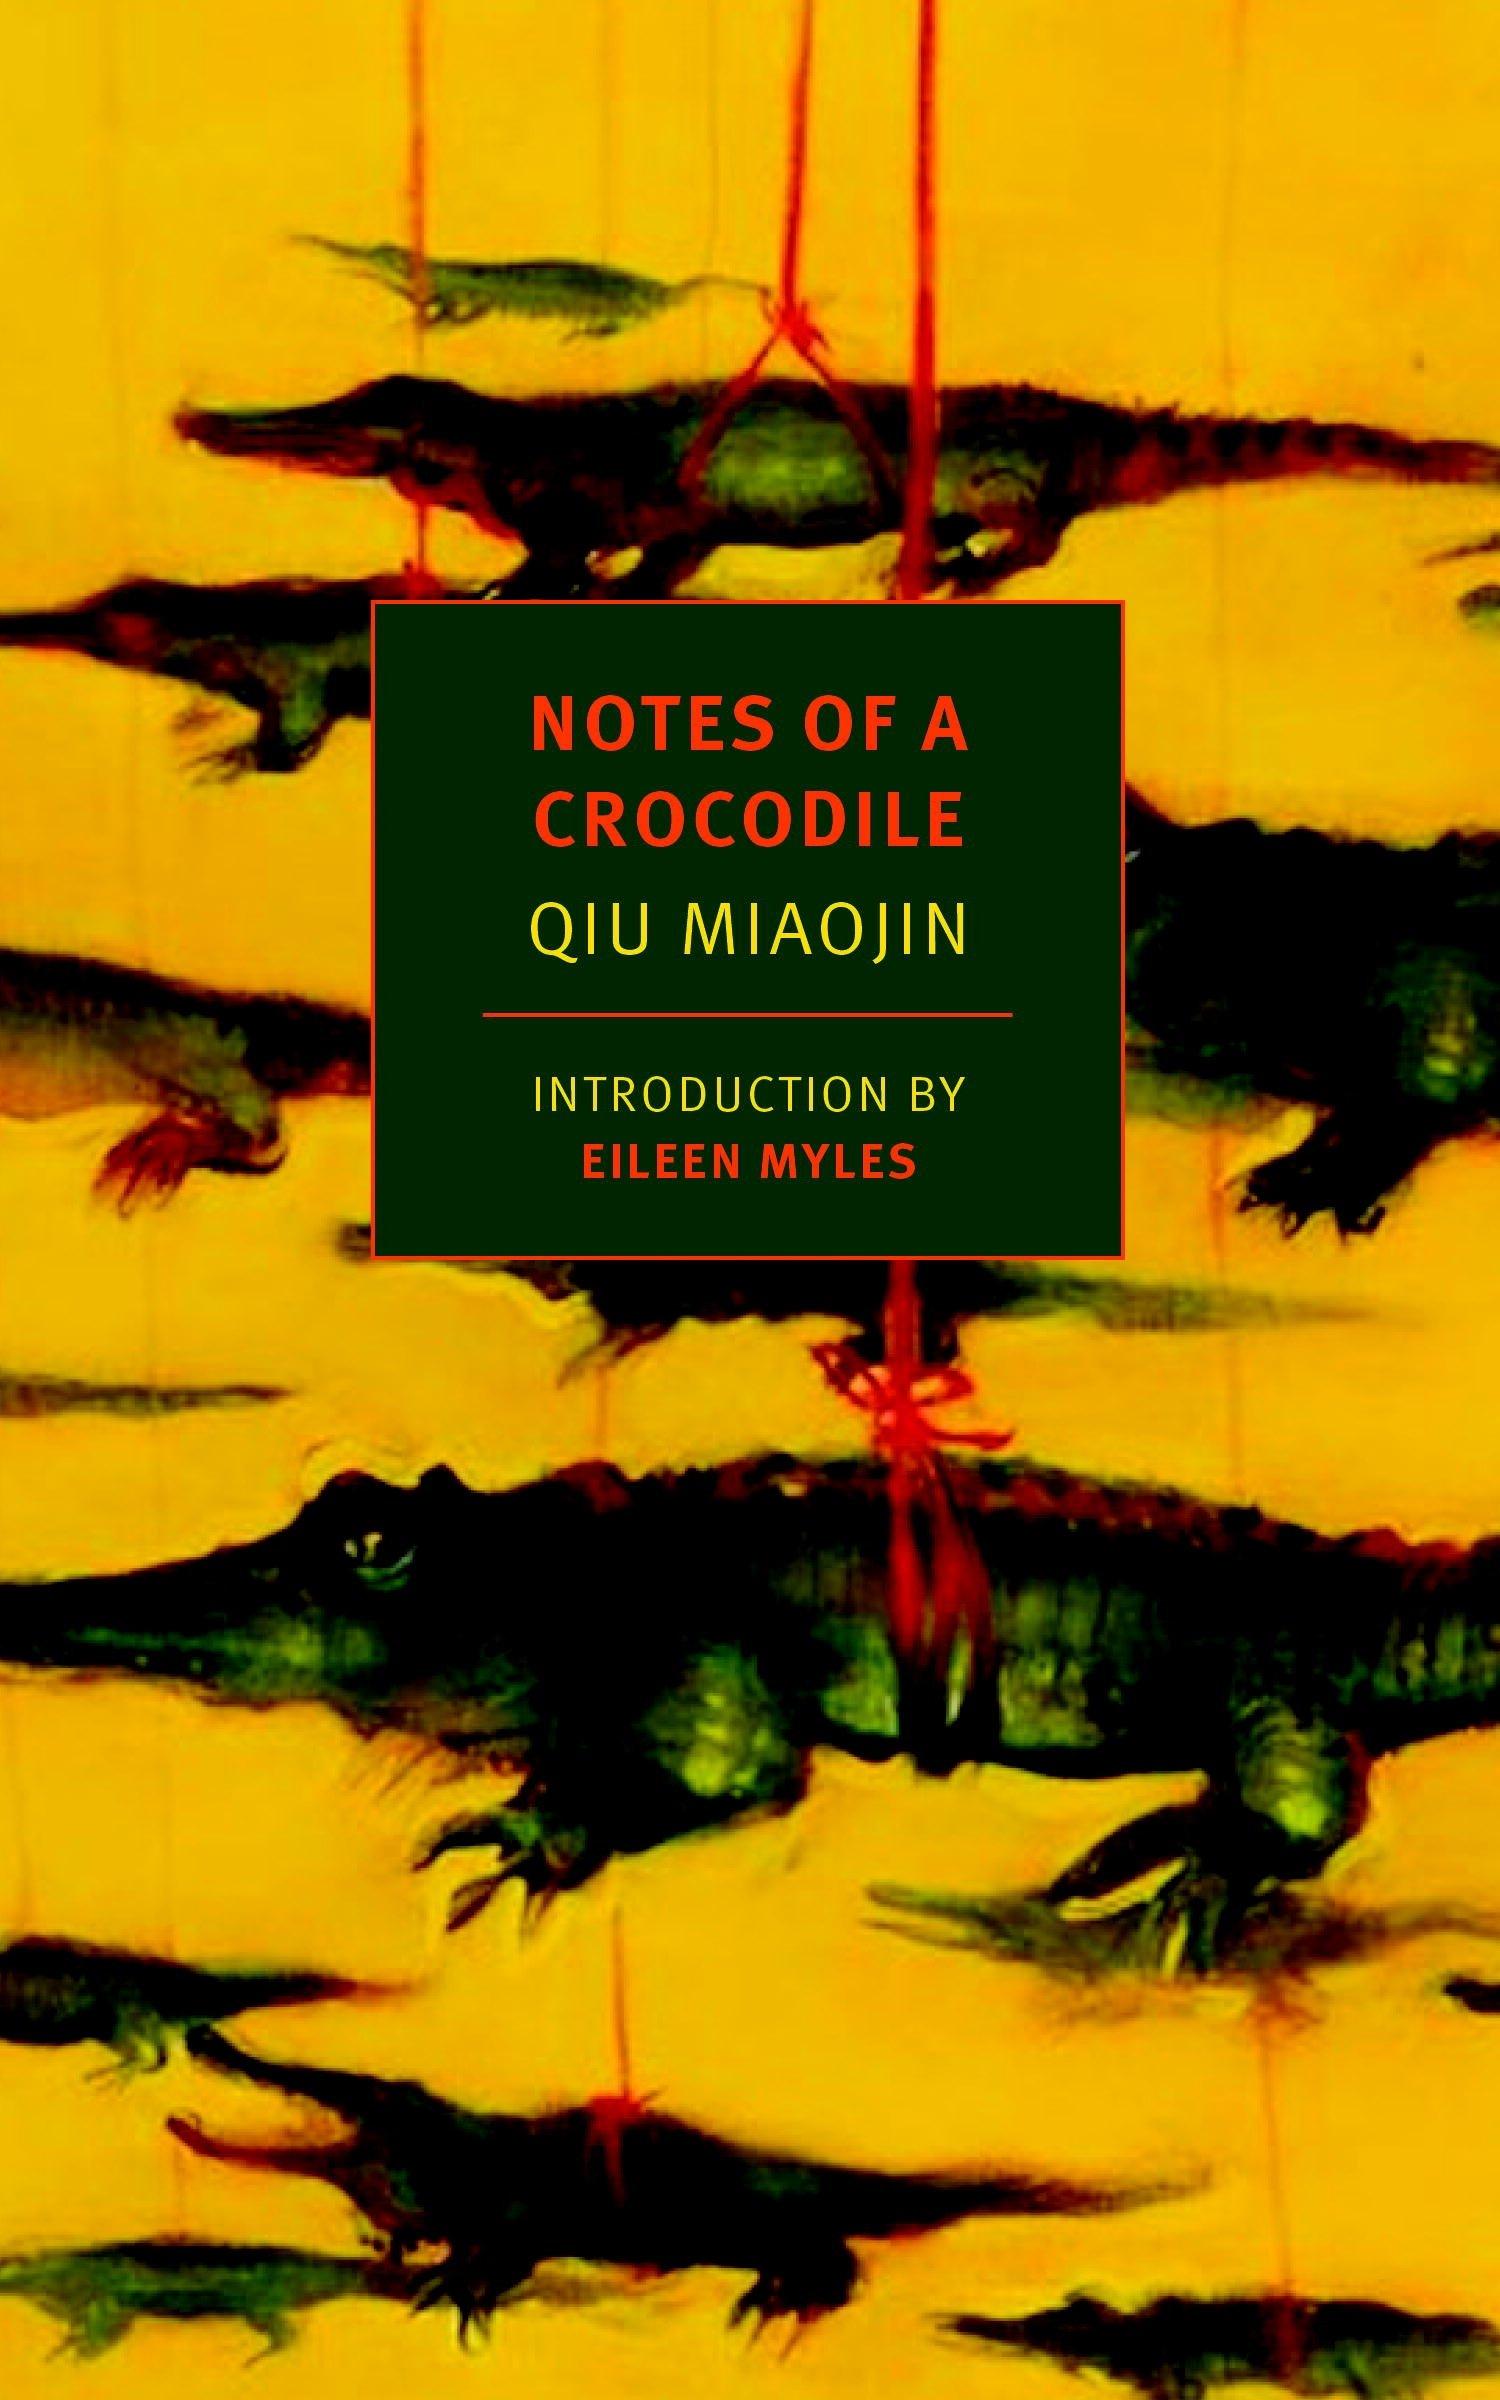 Jamia - Notes of a Crocodile by Qiu Miaojin, translated by Bonnie HuiePublished by: NYRBChina